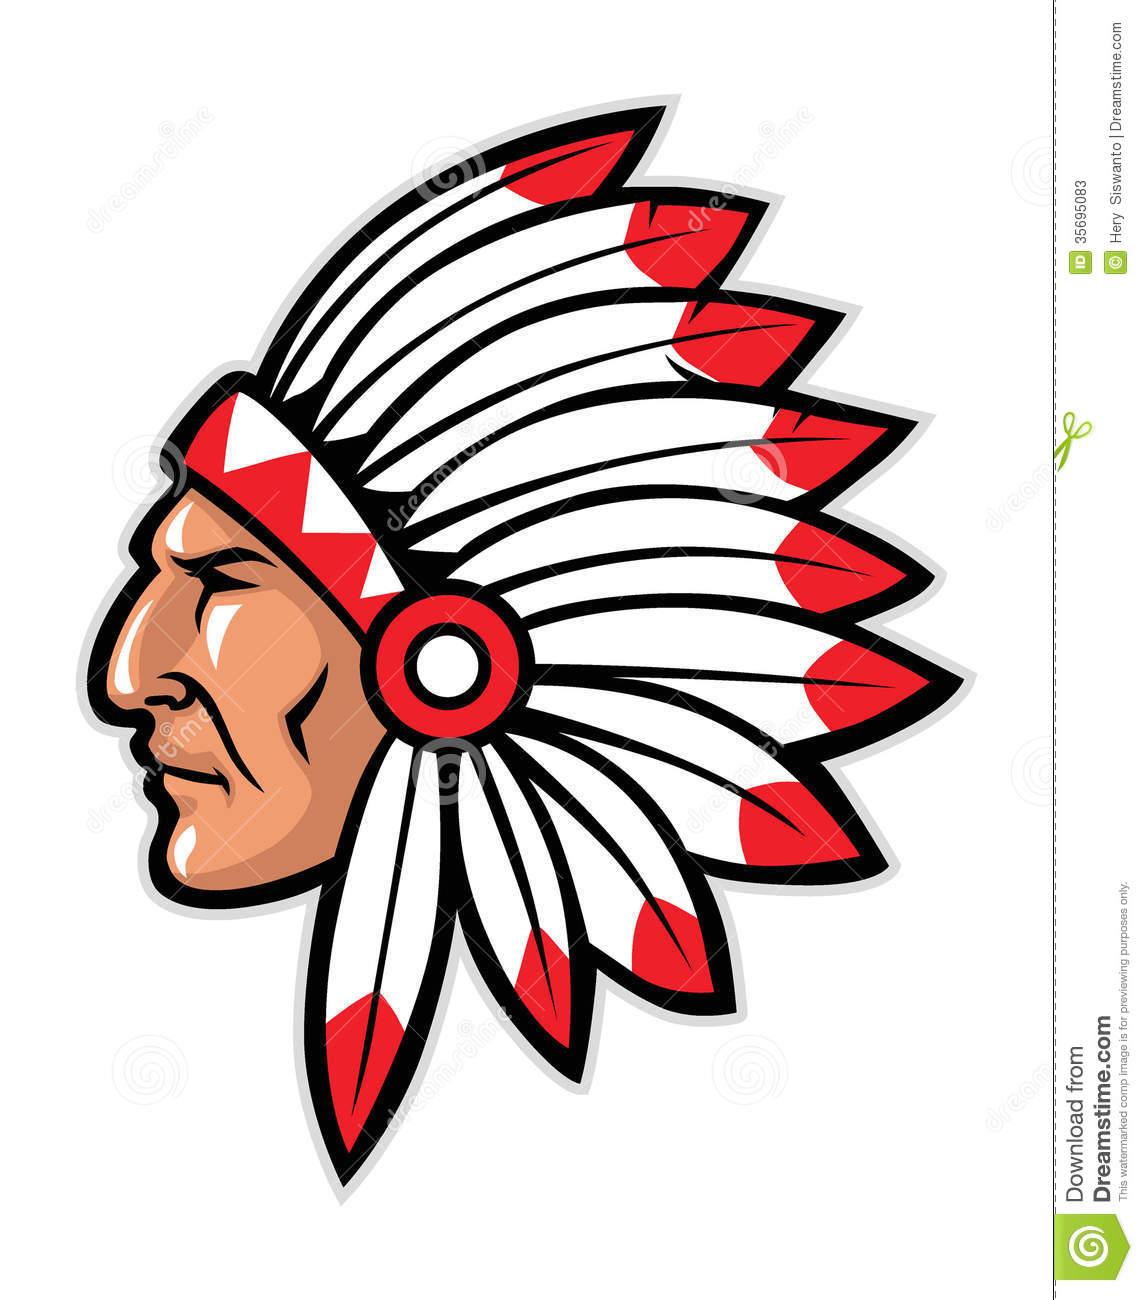 Indian Head Mascot-Indian Head Mascot-18